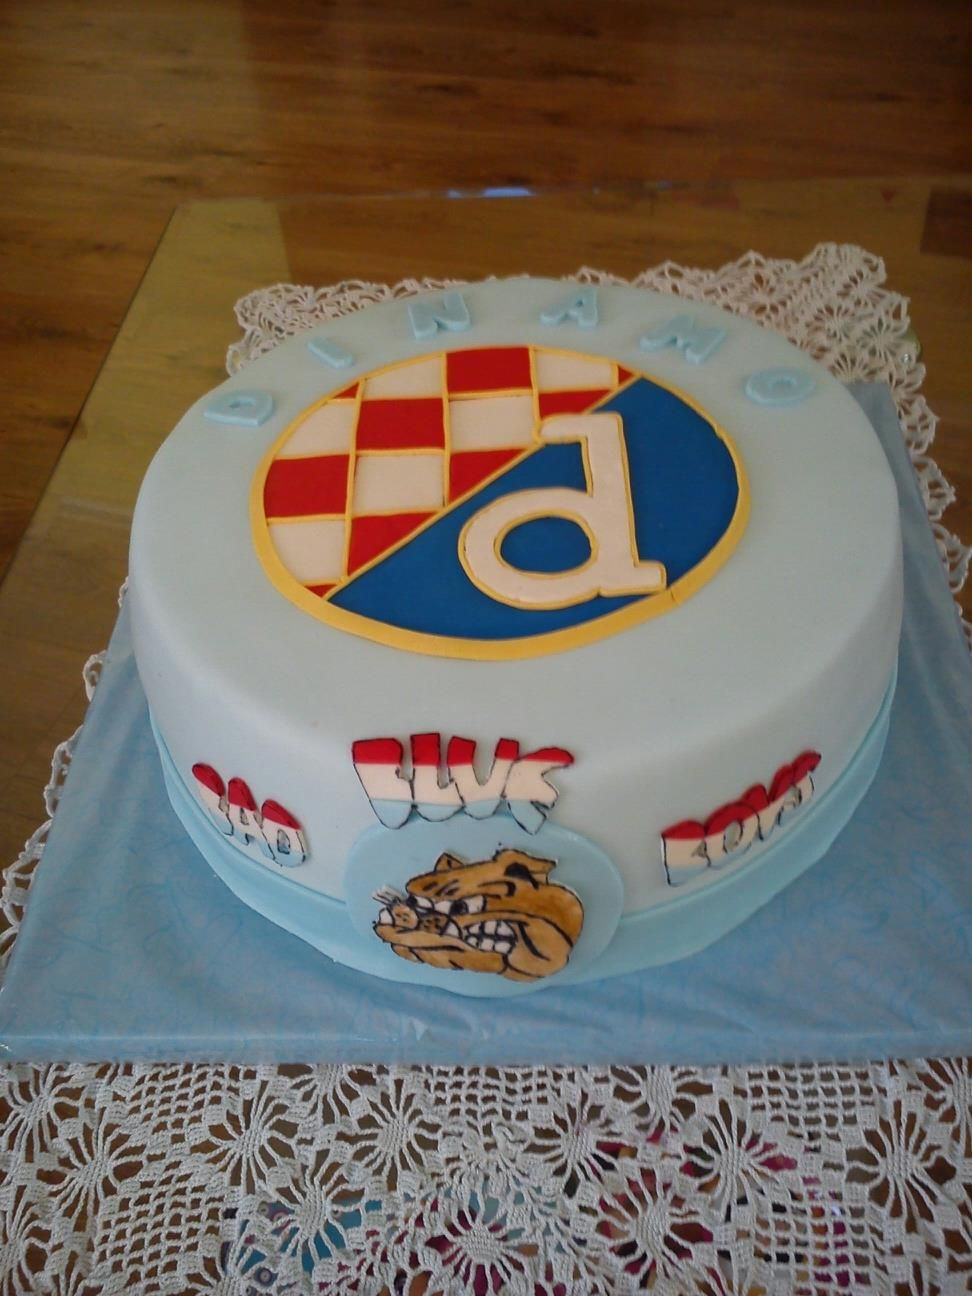 Dinamo Zagreb Childrens Birthday Cakes Sport Cakes Cake